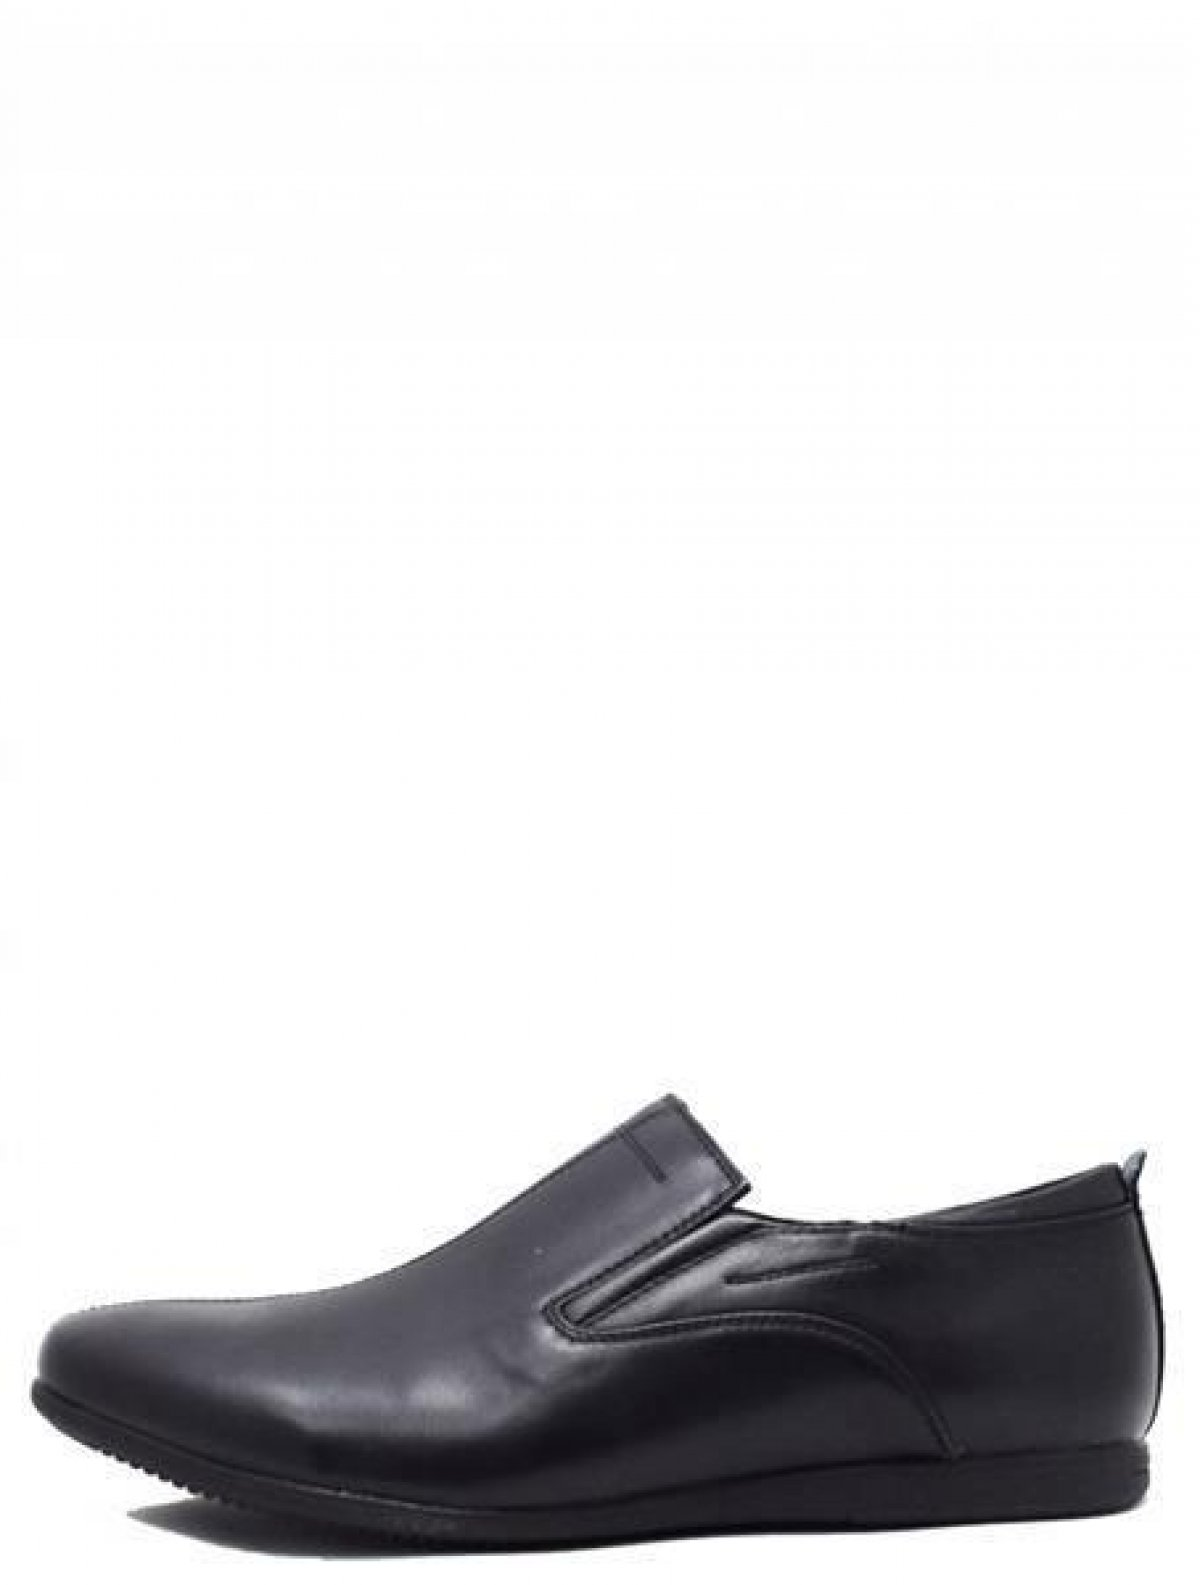 801-1T мужские туфли